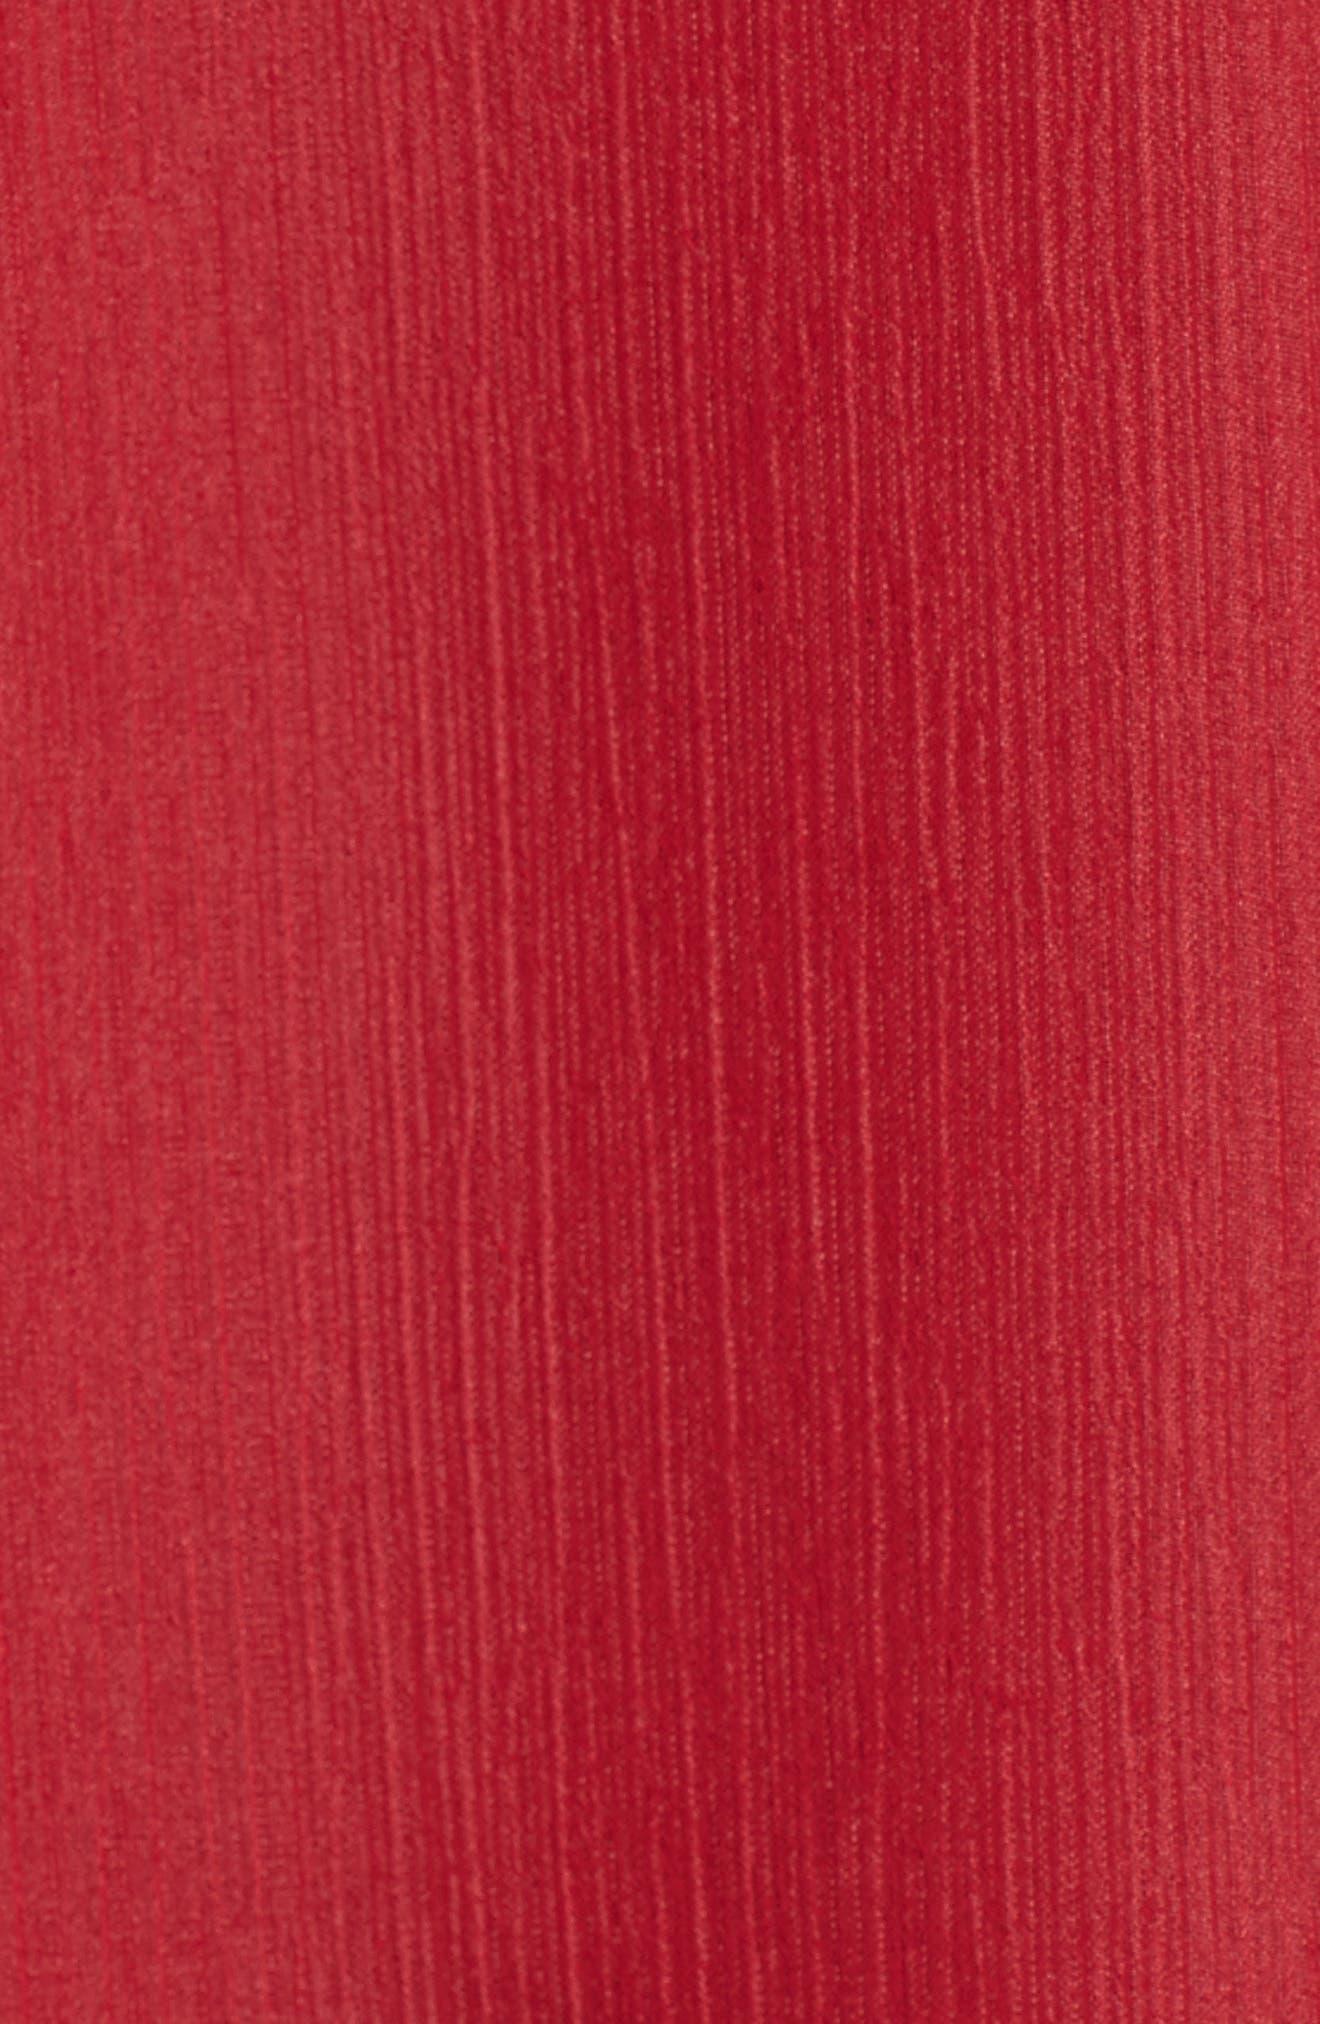 Ruffle One-Shoulder Blouse,                             Alternate thumbnail 10, color,